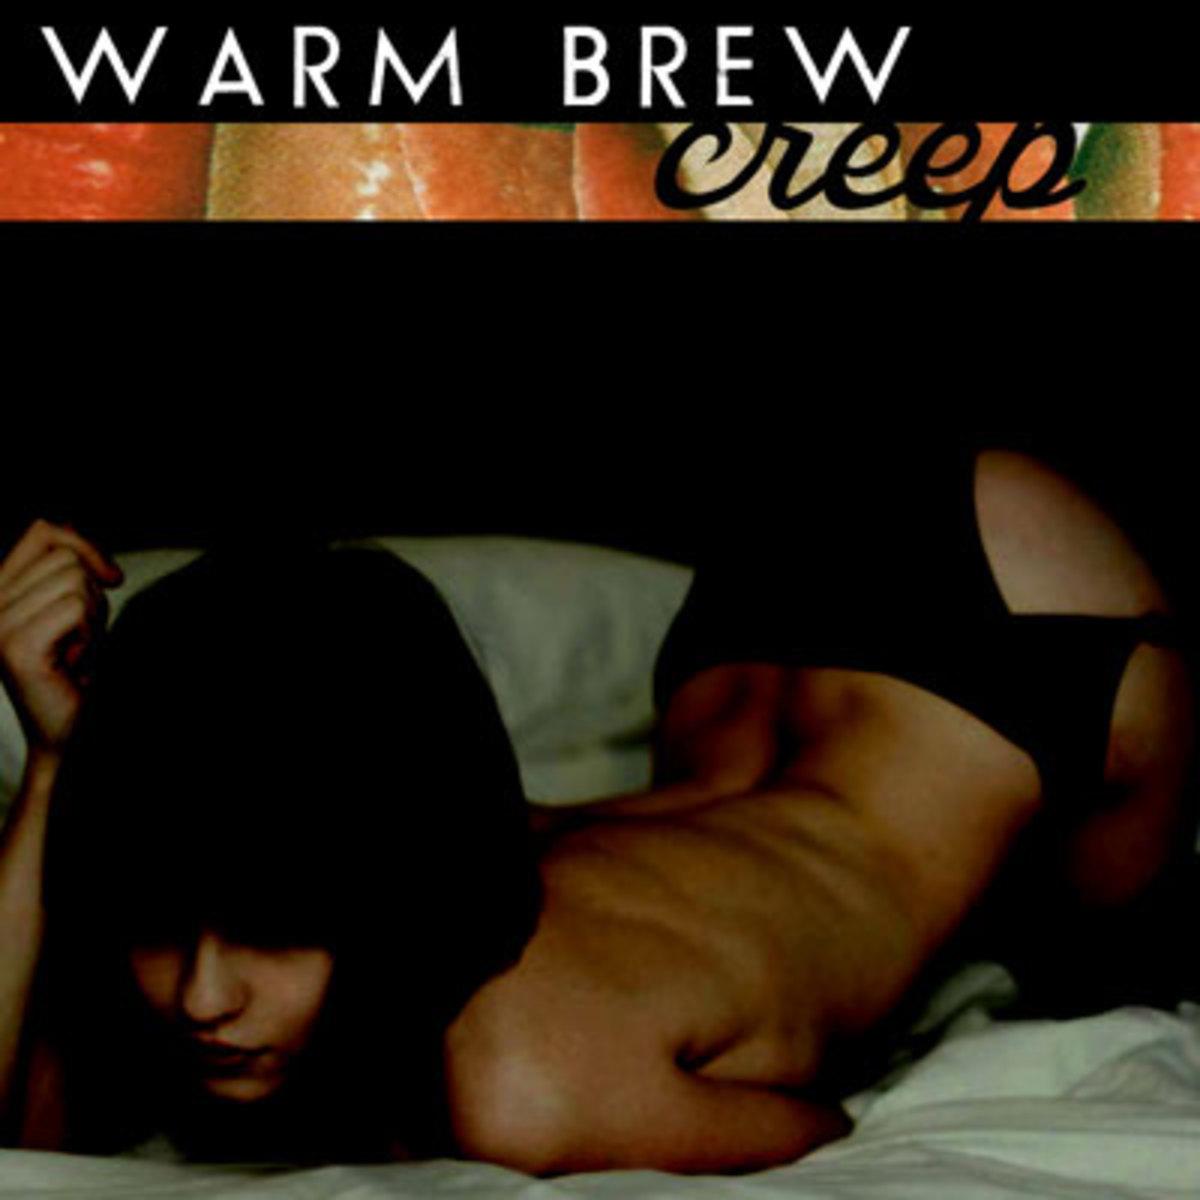 warmbrew-creep.jpg